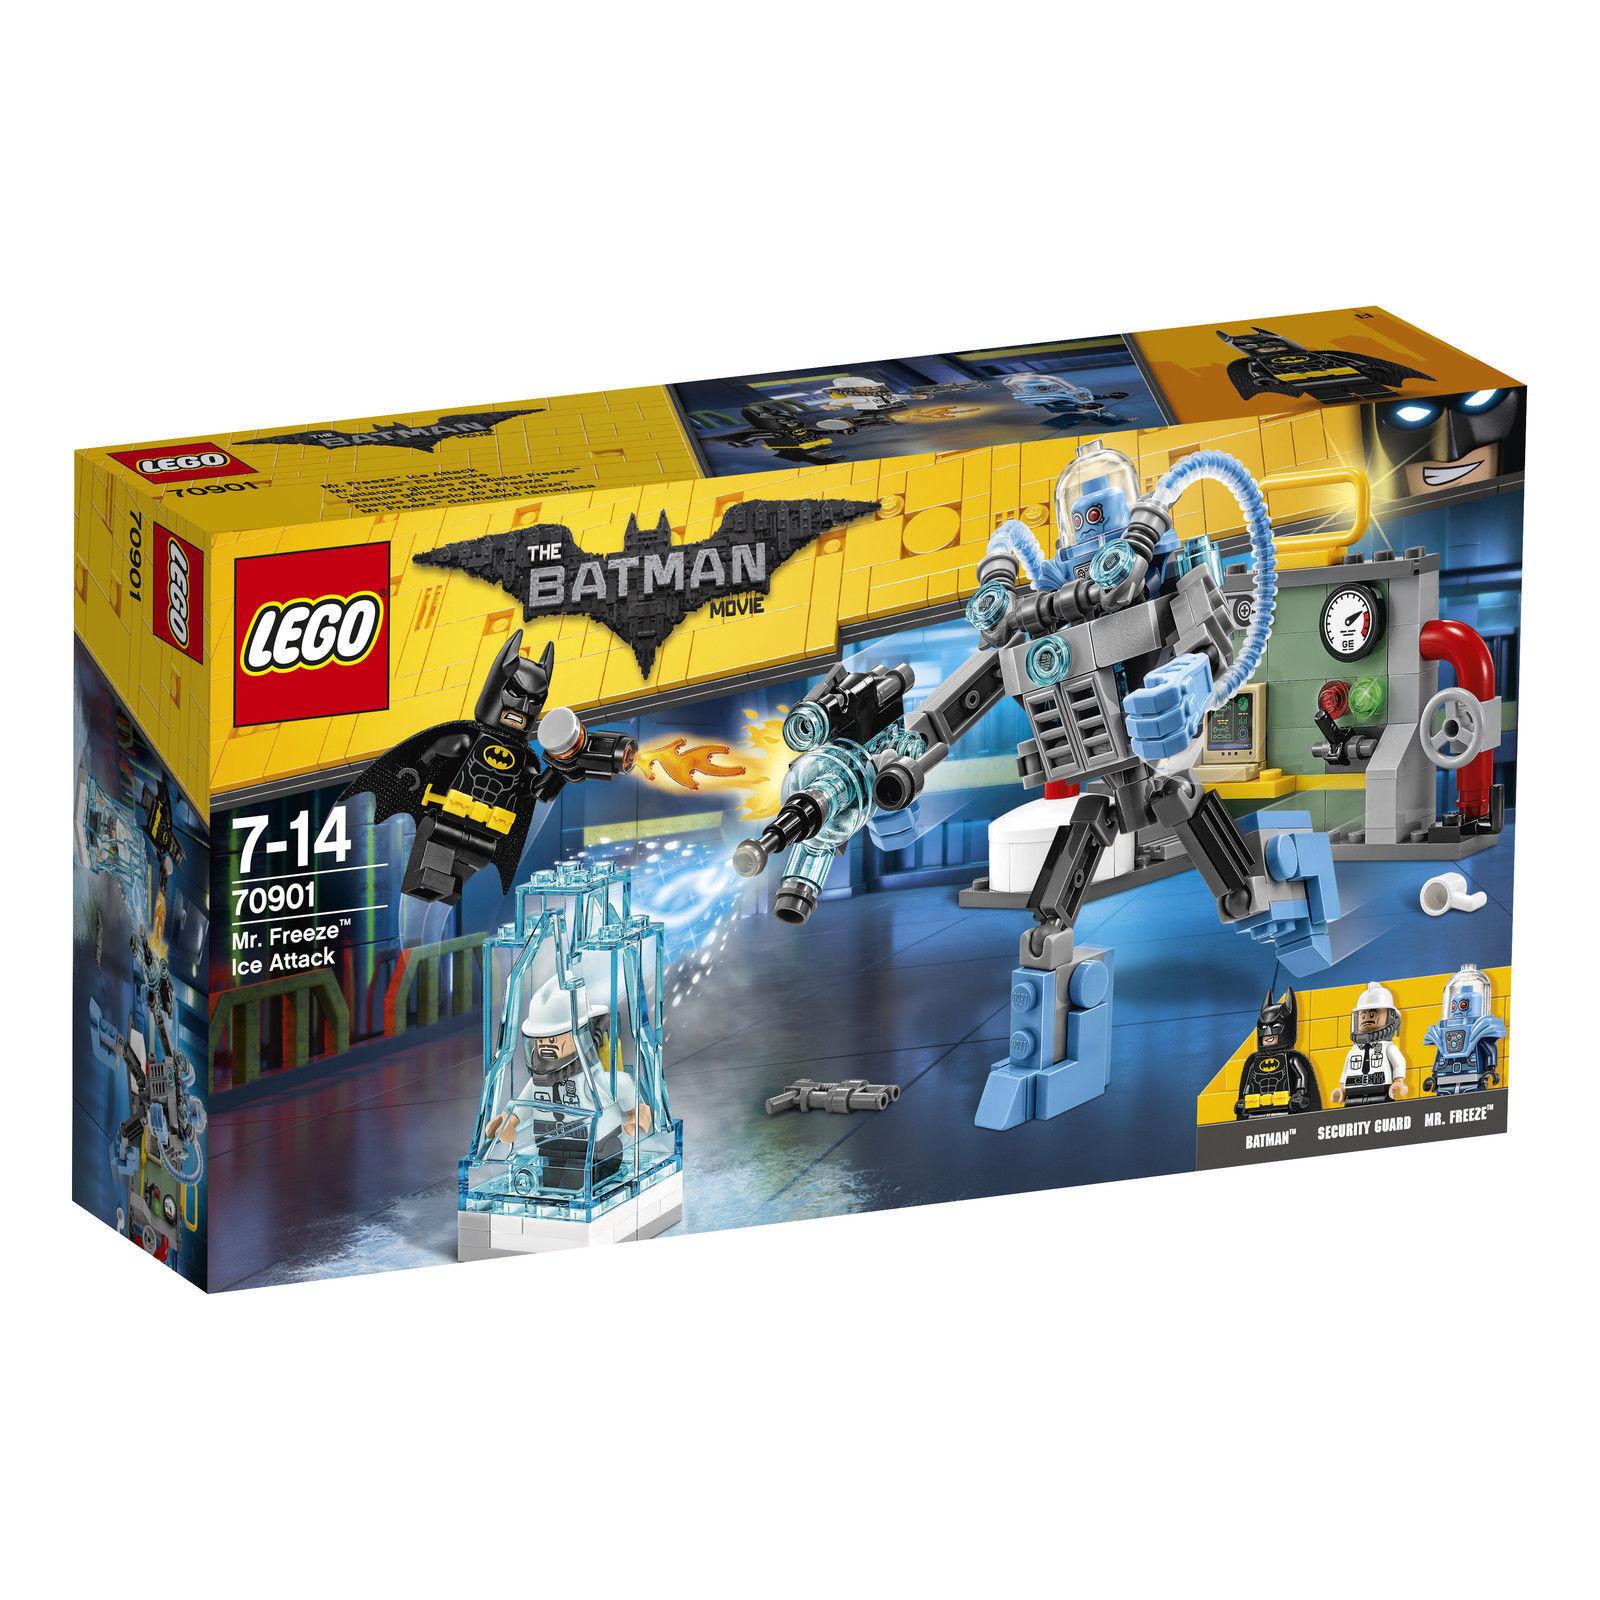 Lego Batman Película 70901  mr. Freeze ataque De Hielo-Totalmente Hielo-Totalmente Hielo-Totalmente Nuevo  moda clasica